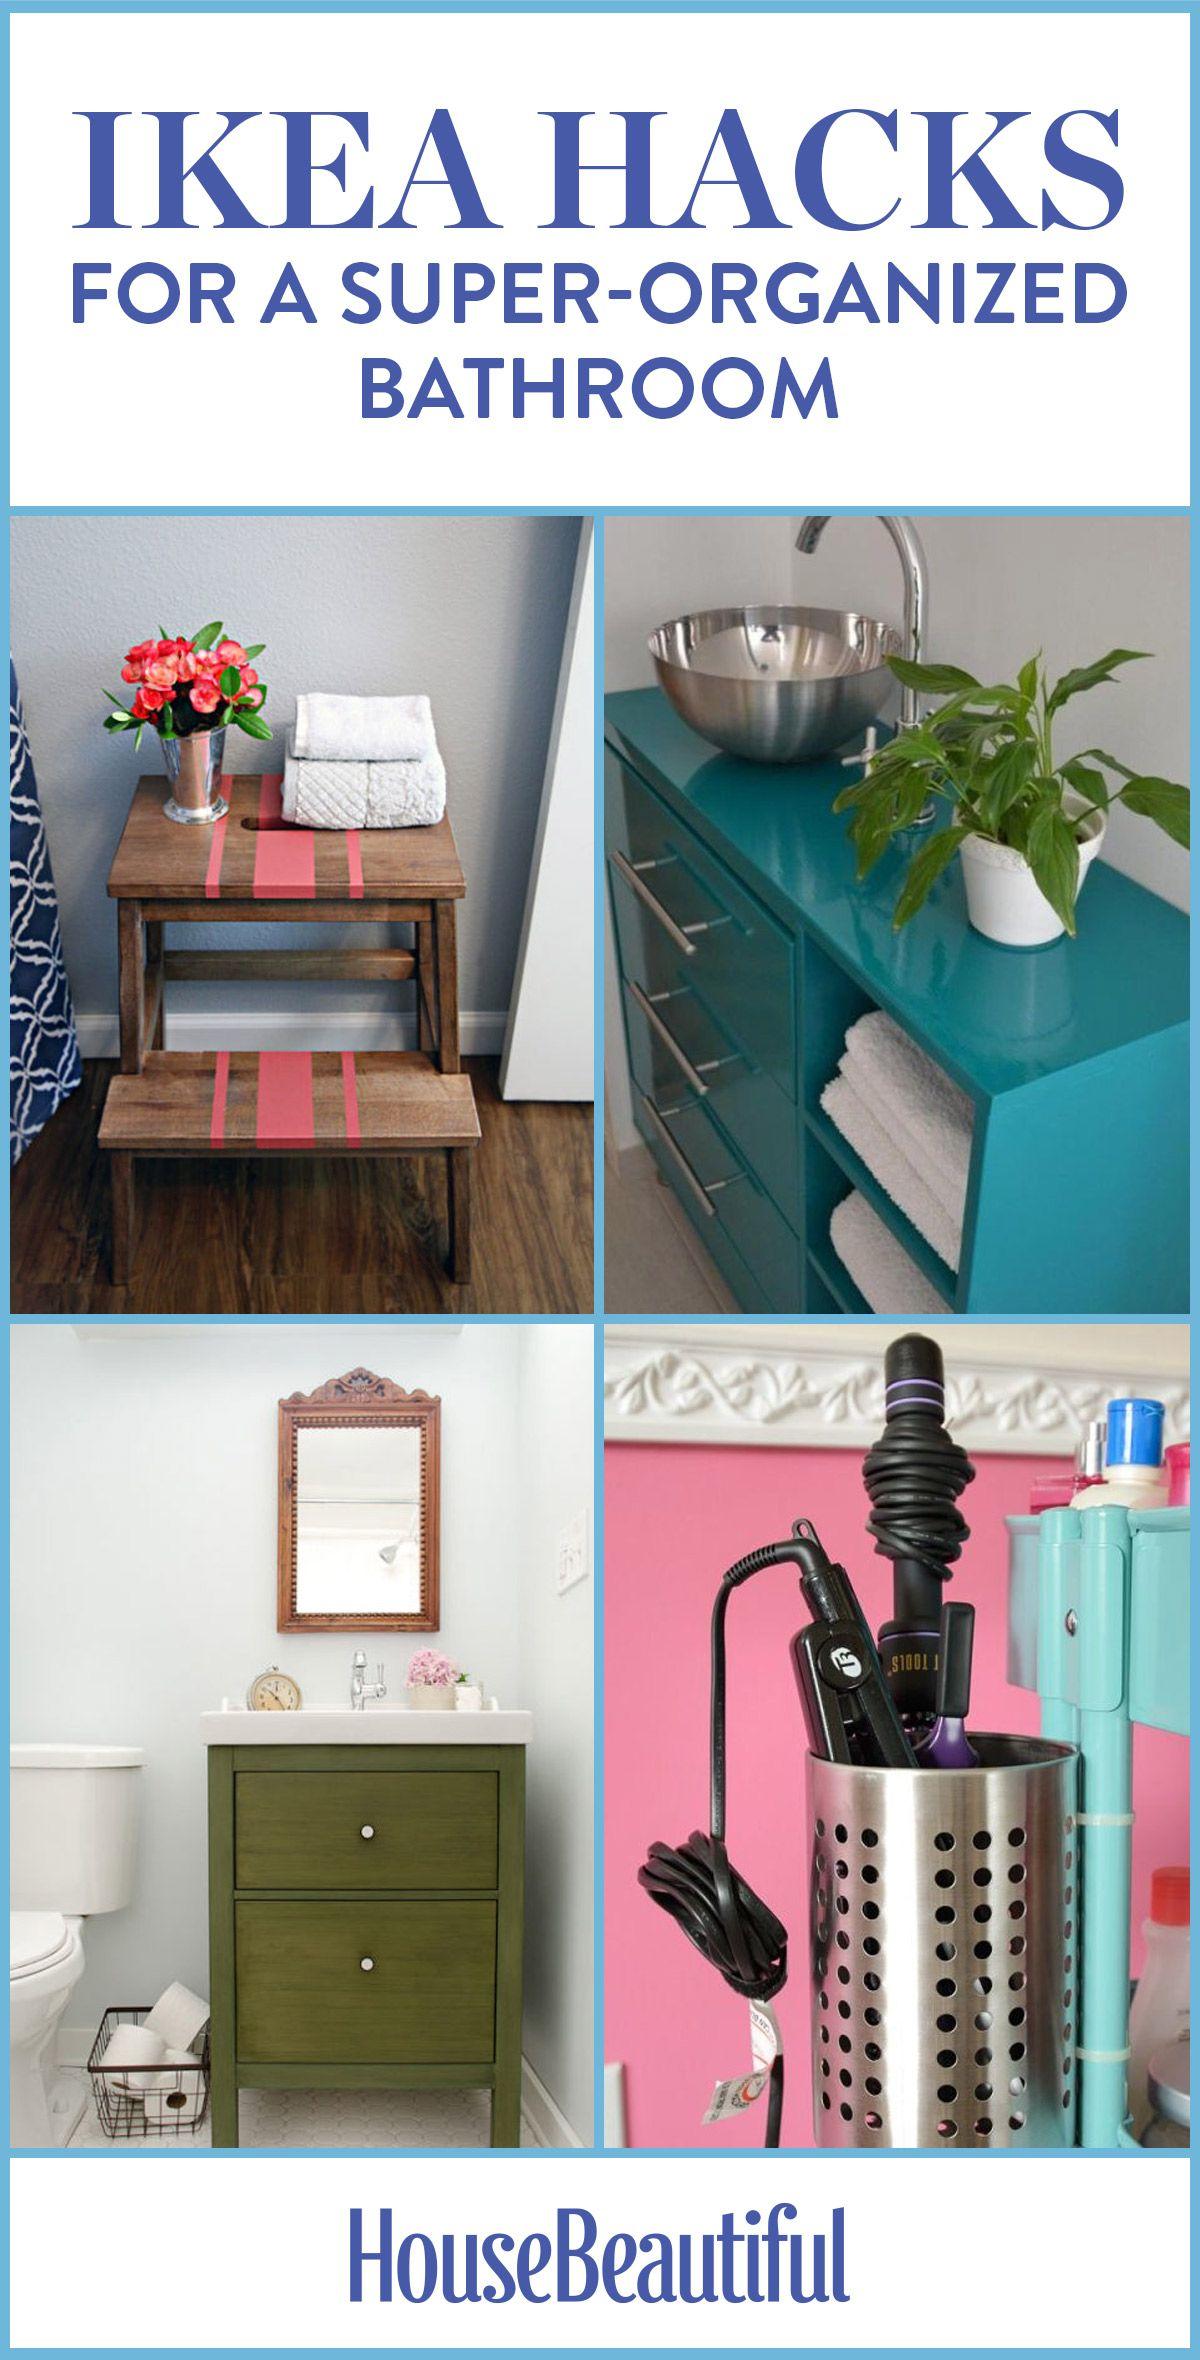 11 Brillant IKEA Hacks for a Super-Organized Bathroom